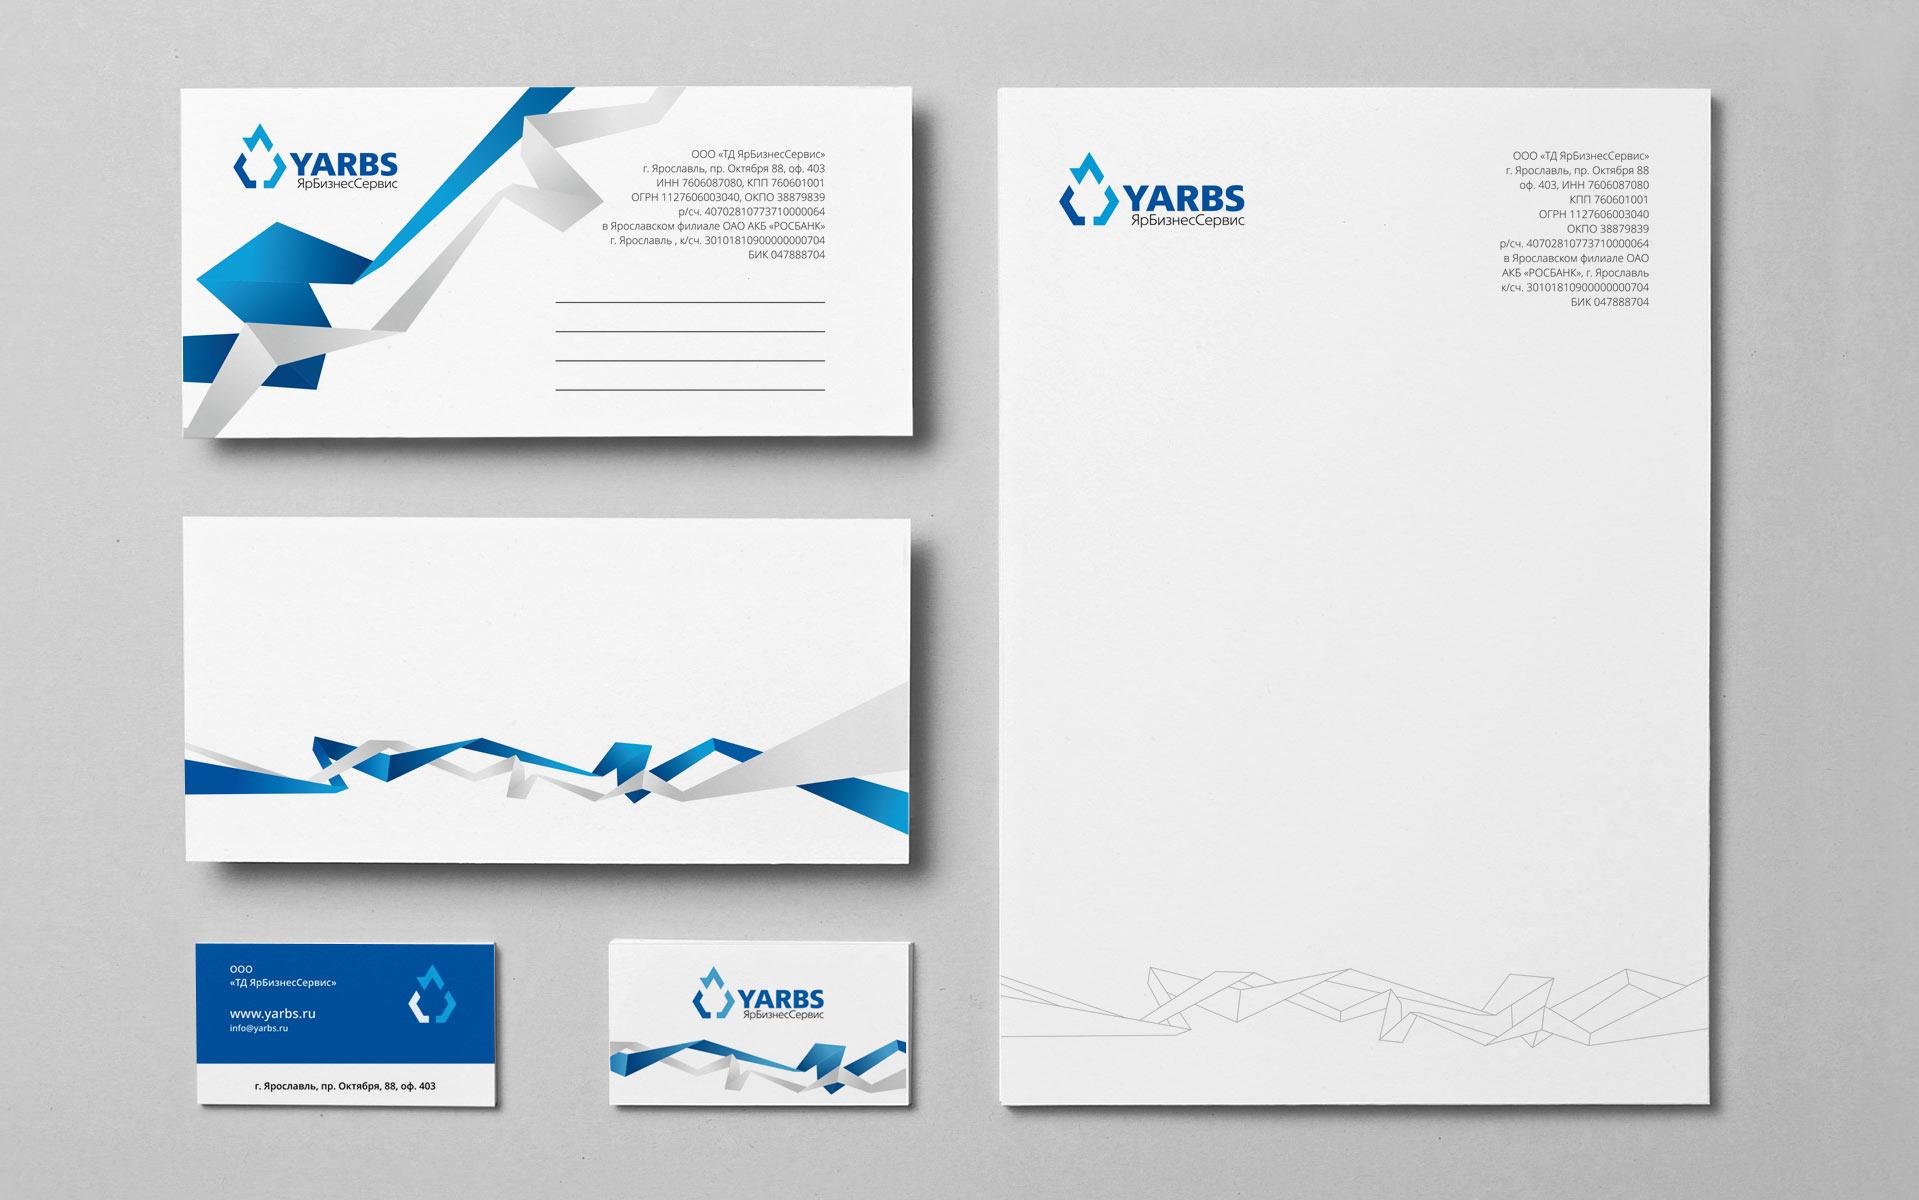 YARBS-разработка-фирменного-стиля